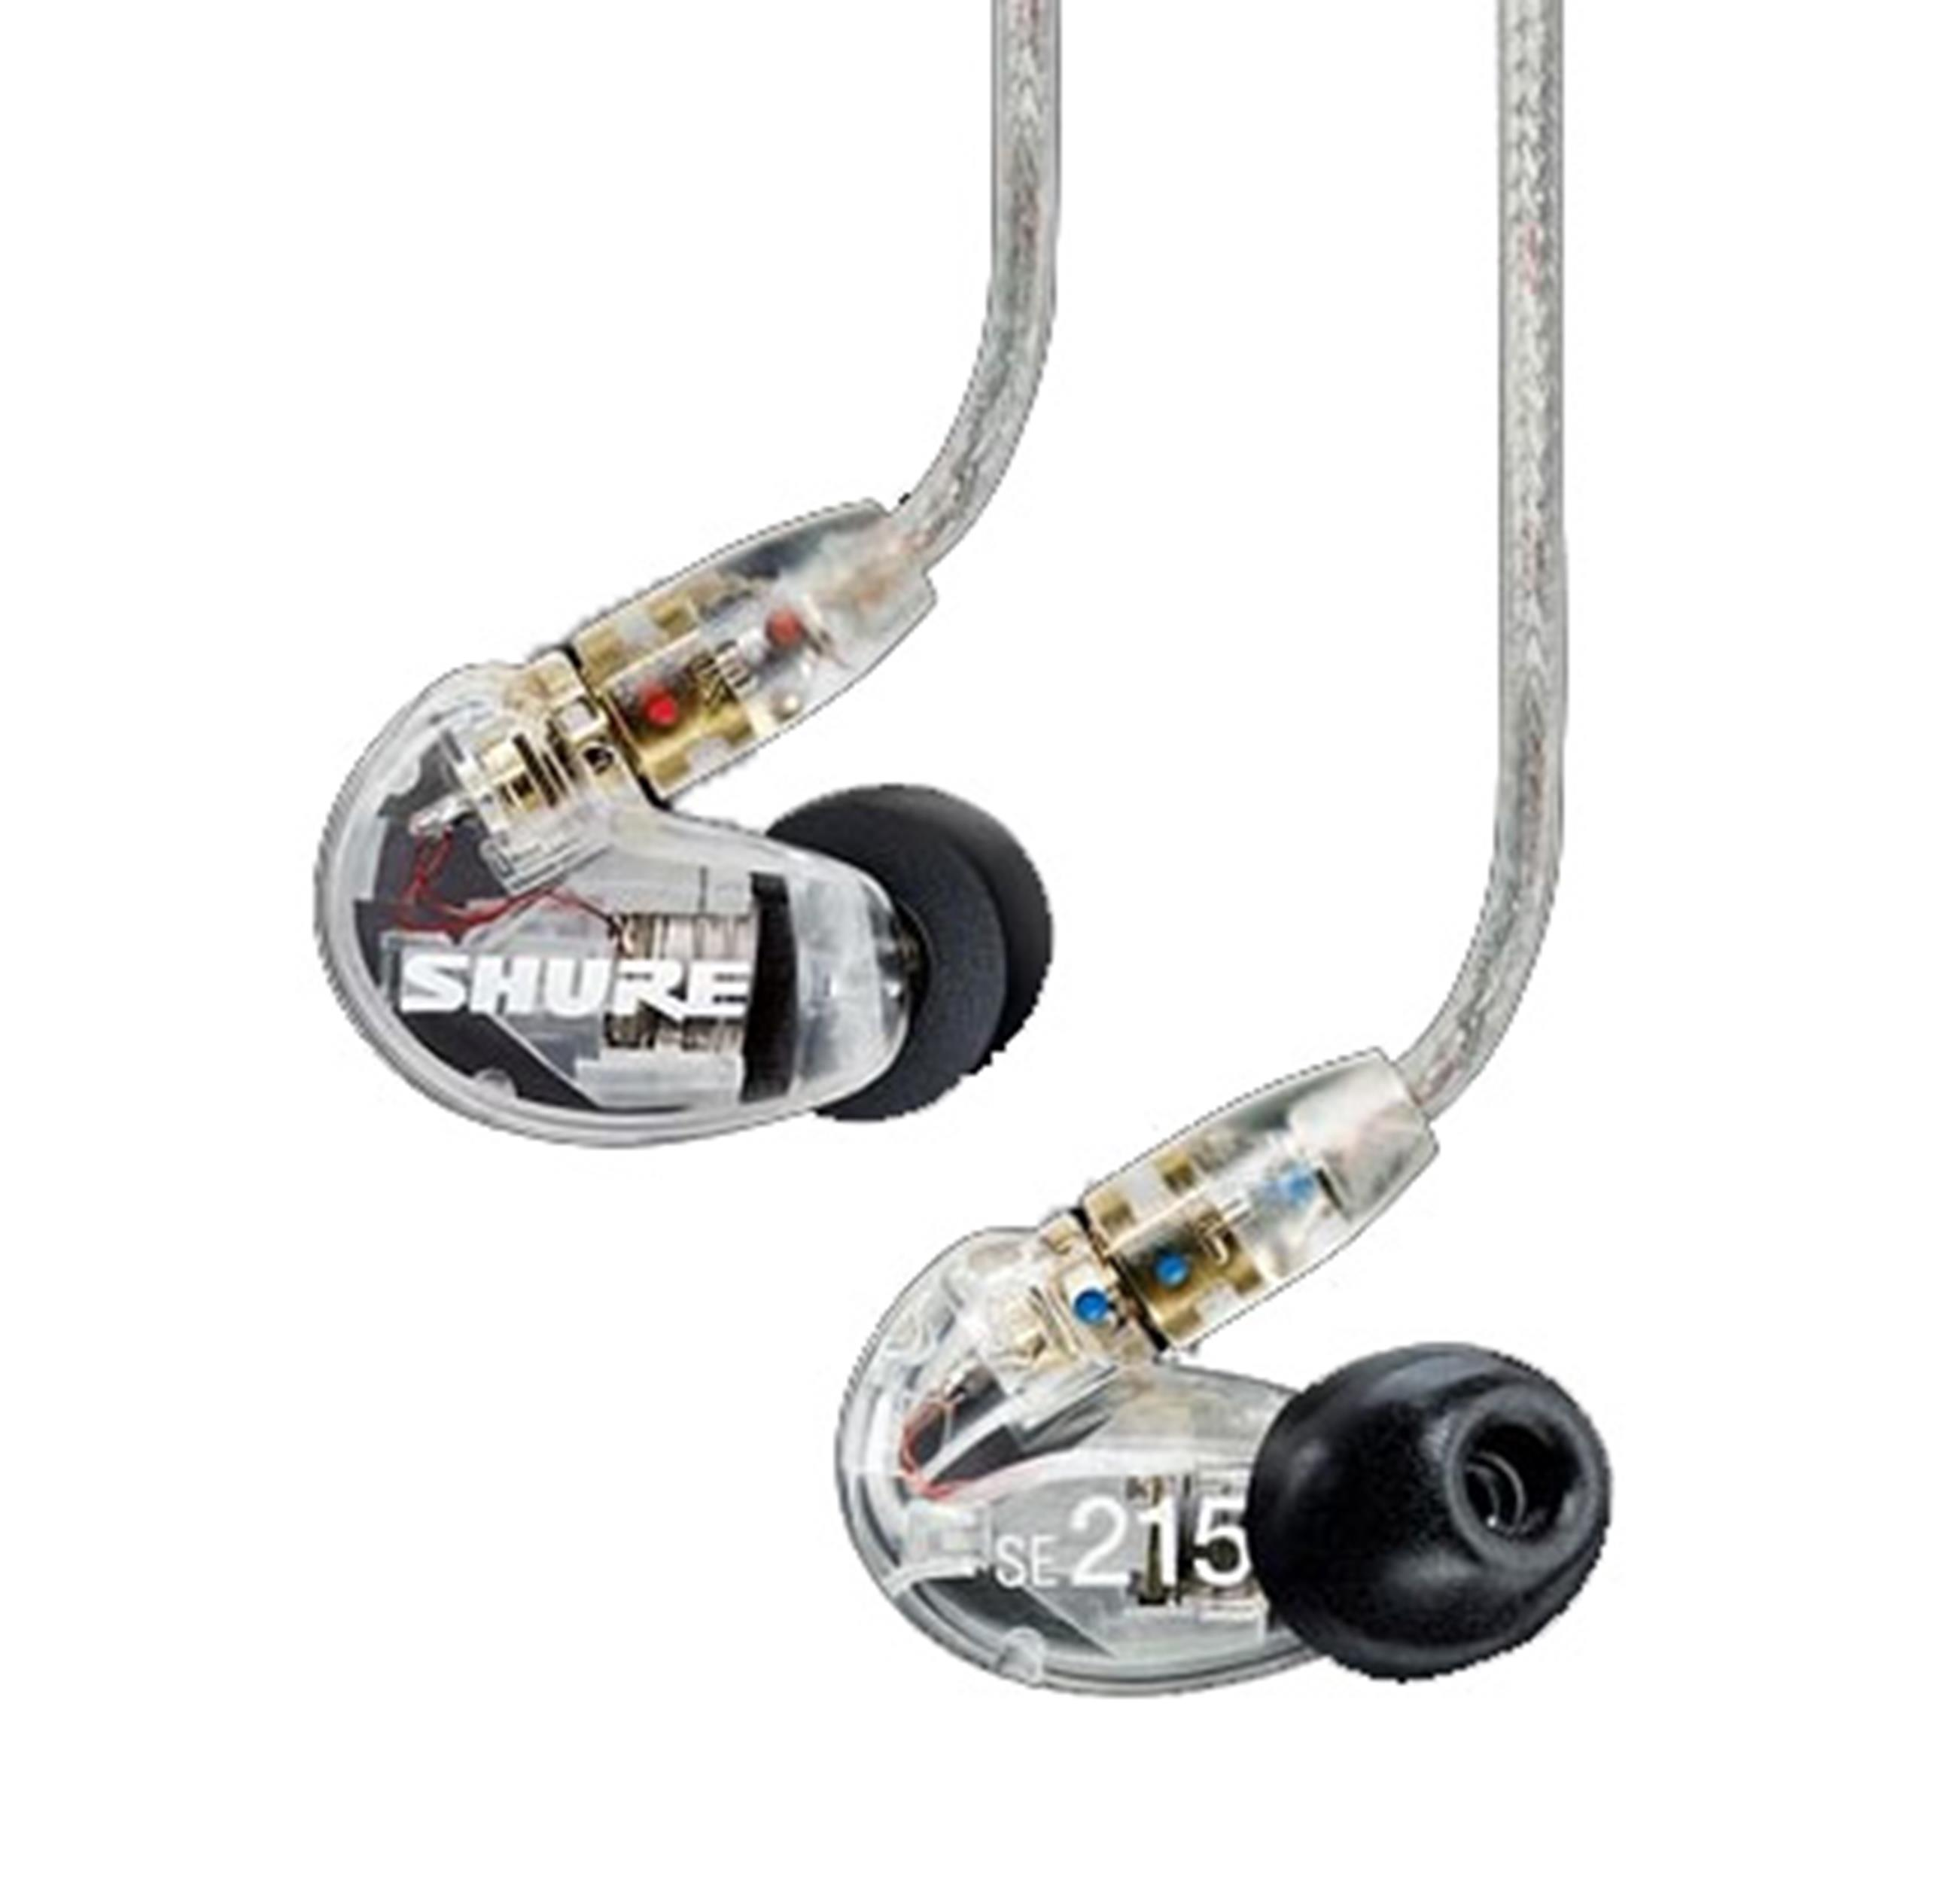 SHURE SE215 TRASPARENTI EAR MONITOR